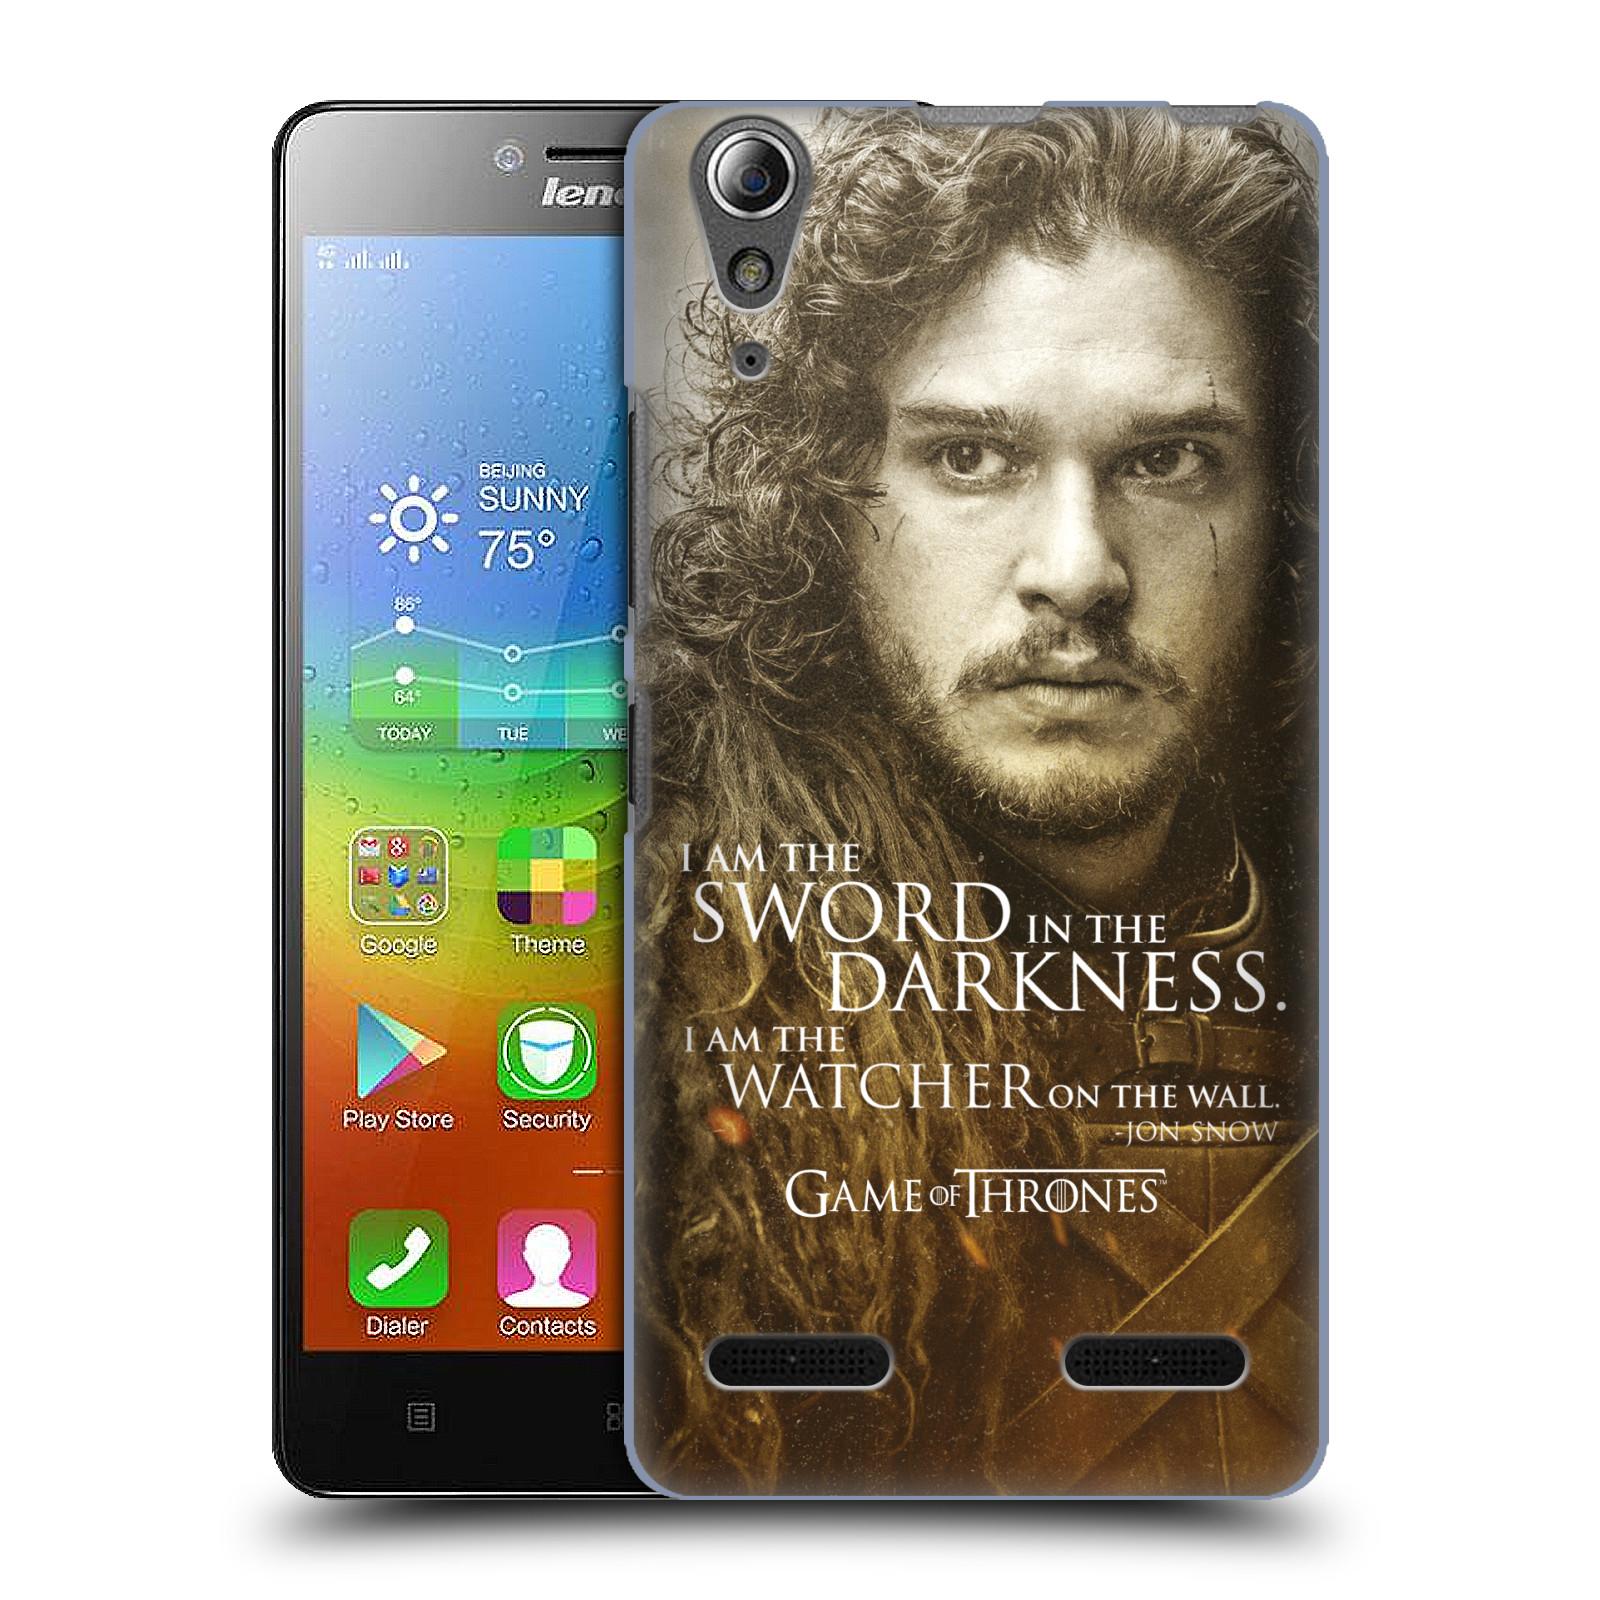 Plastové pouzdro na mobil Lenovo A6000 HEAD CASE Hra o trůny - Jon Snow (Plastový kryt či obal na mobilní telefon s licencovaným motivem Hra o trůny - Game Of Thrones pro Lenovo A6000)